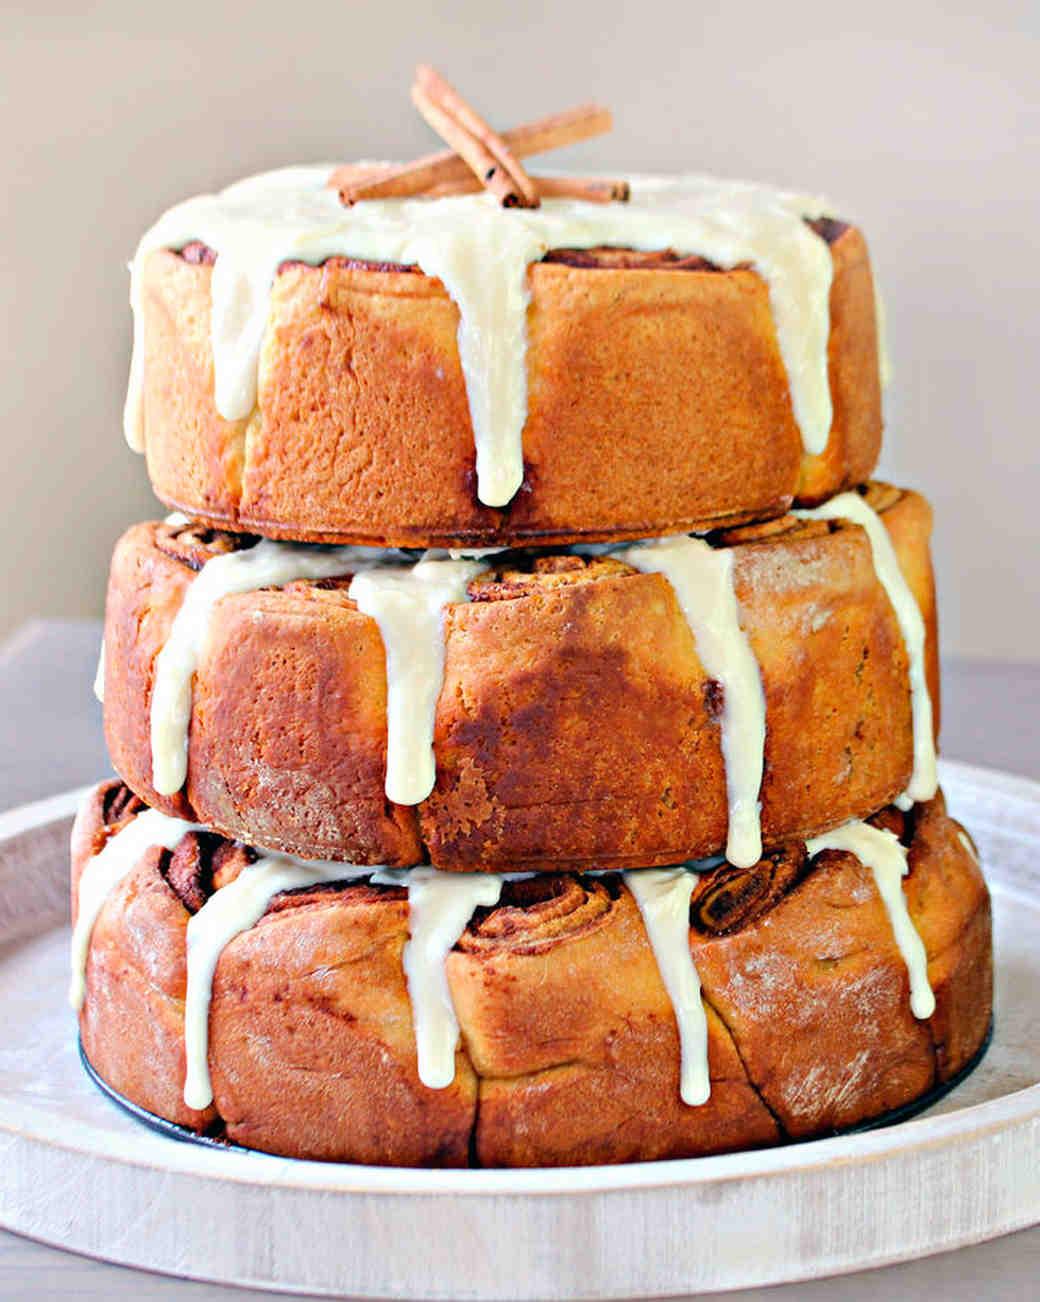 cinnamon-roll-wedding-cake-1015.jpg